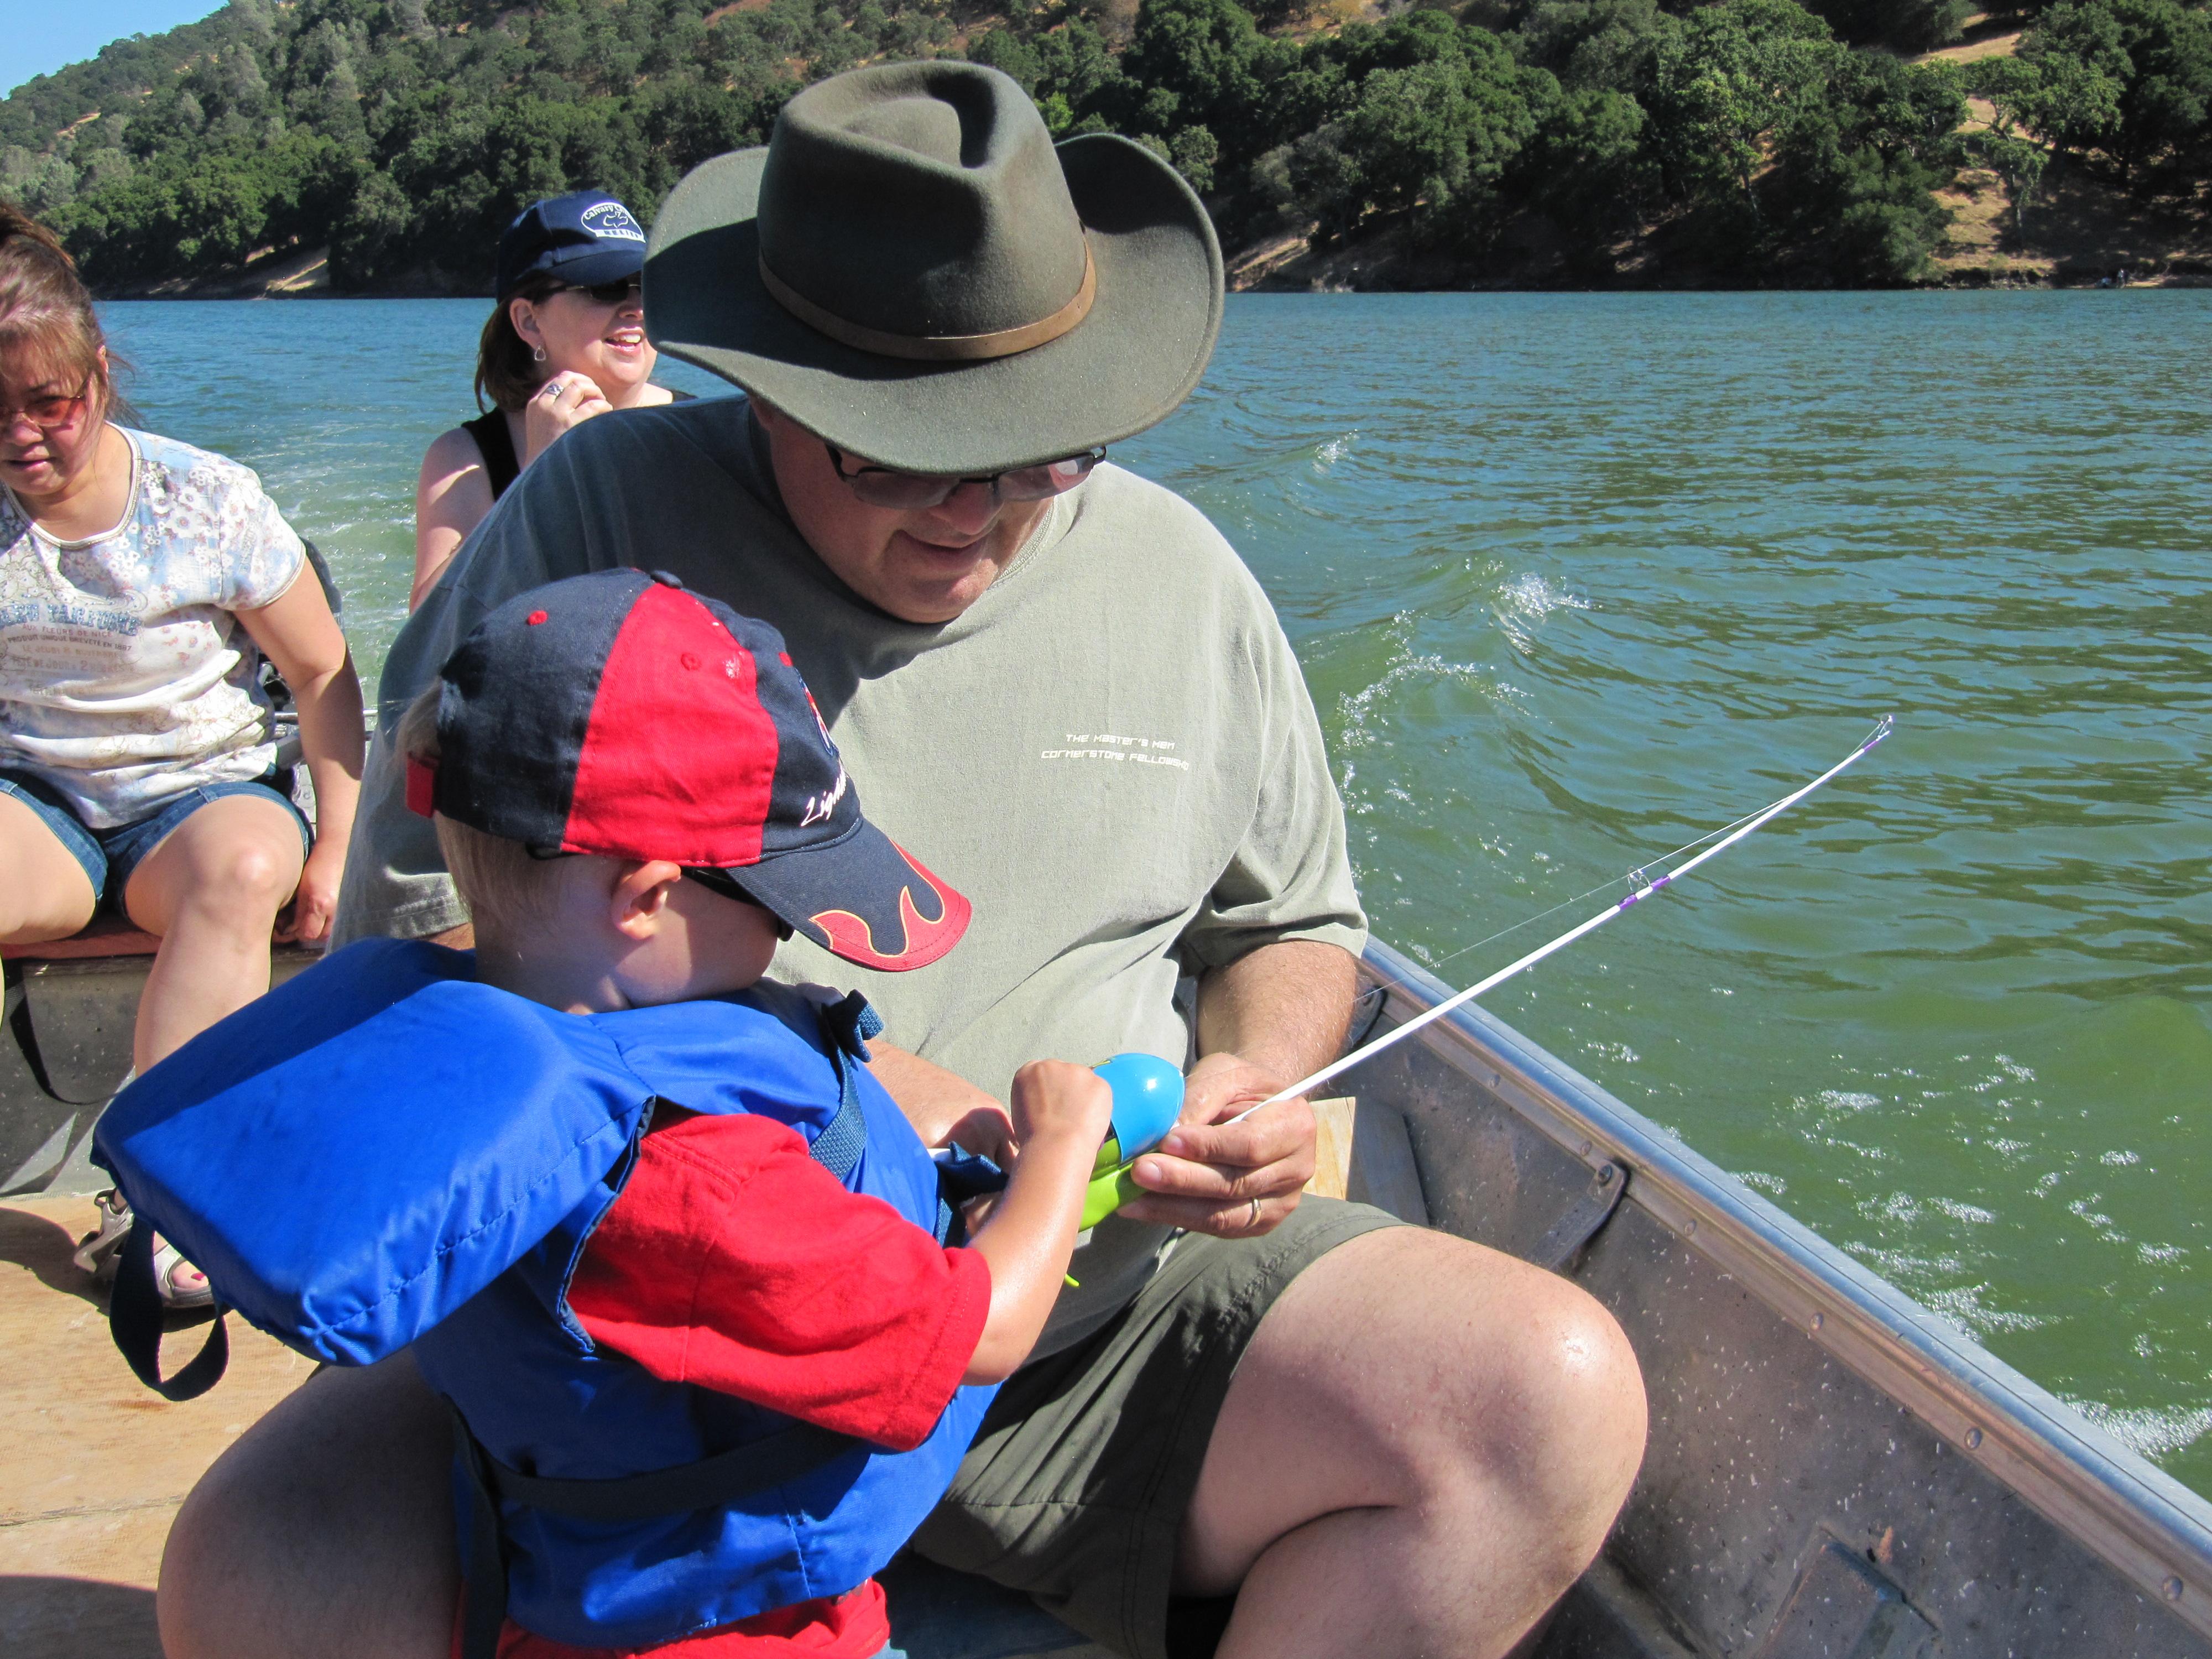 Lake del valle for Lake del valle fishing report